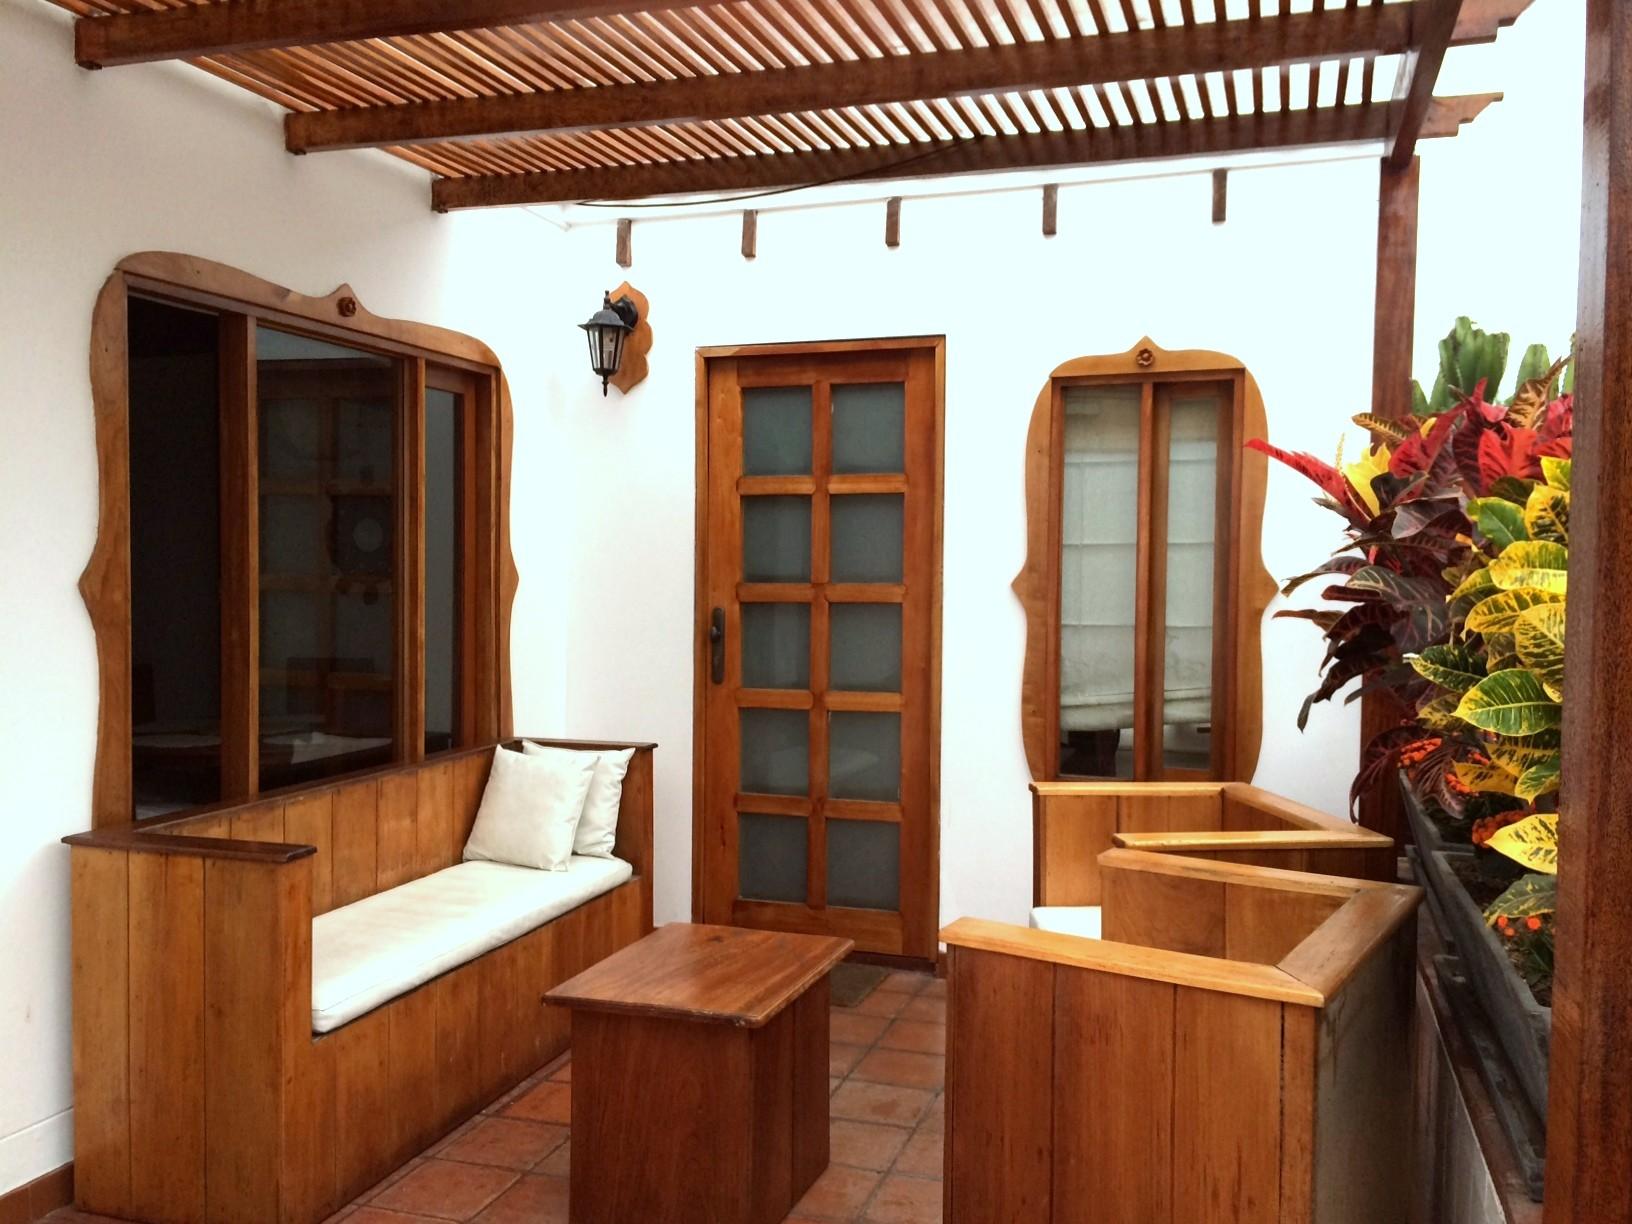 Lima Bedroom Furniture Bedroom In A Lovely Guest House La Maison D Hote De Lima